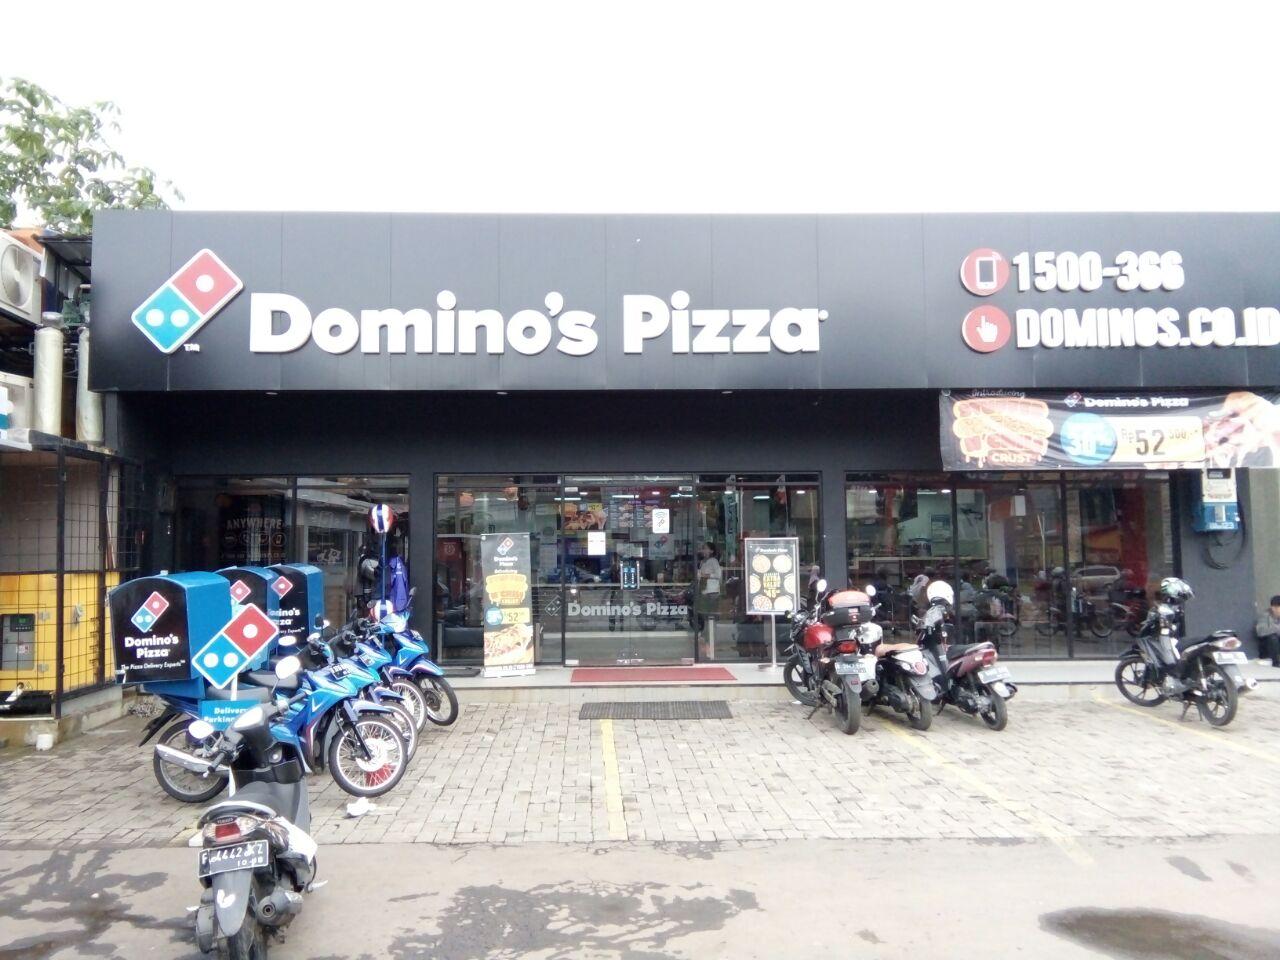 Domino's Pizza - Kec Cimanggis Depok, Depok